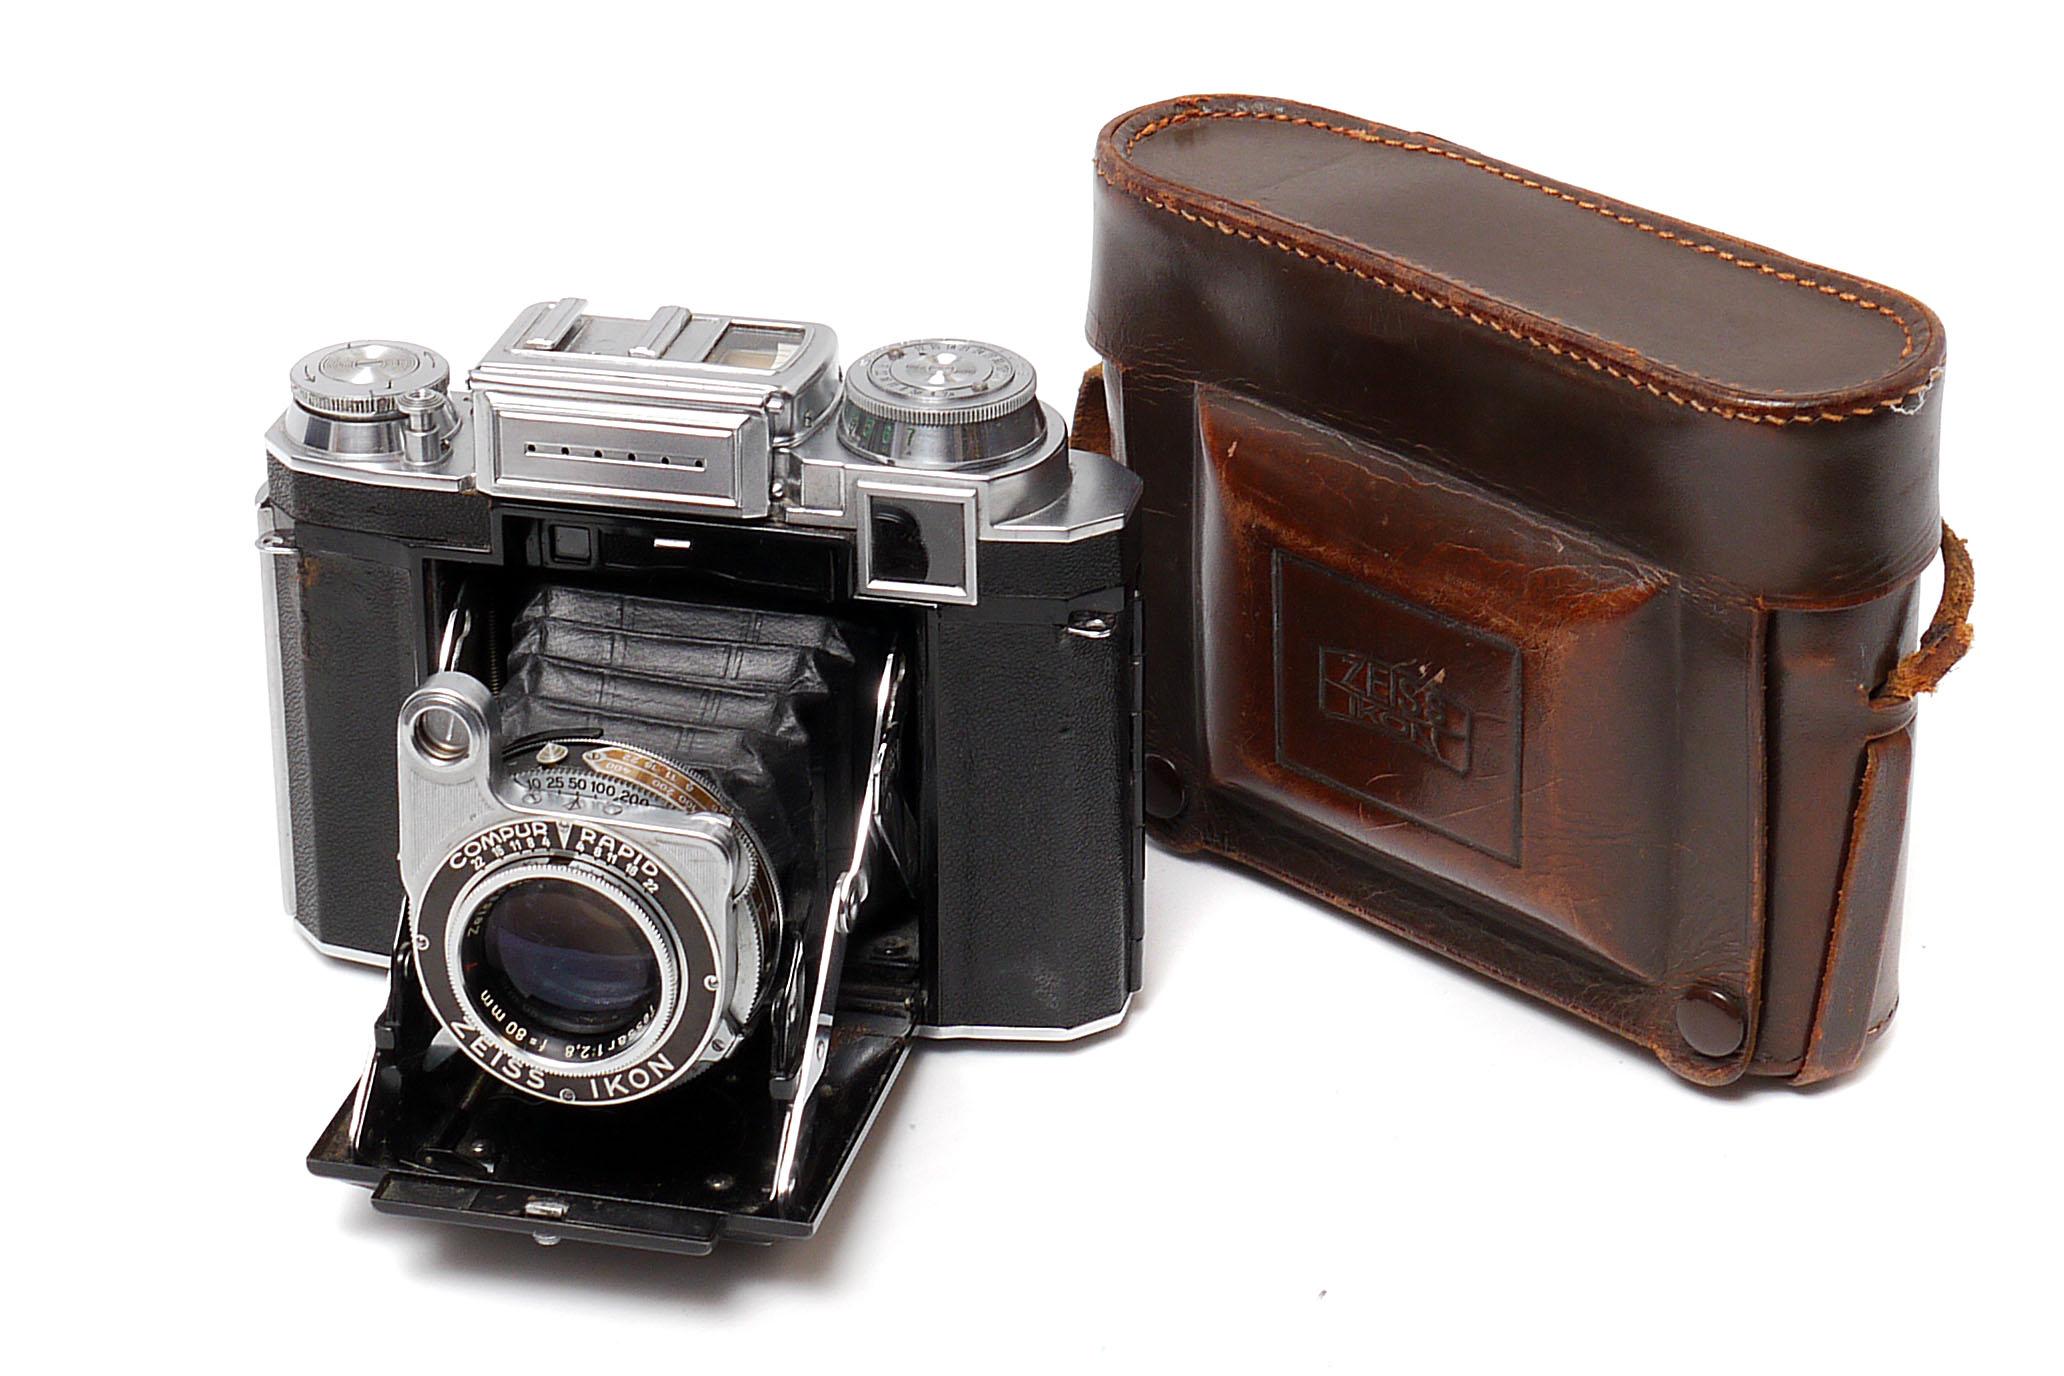 Super Ikonta 533/16 - Camera-wiki.org - The free camera encyclopedia